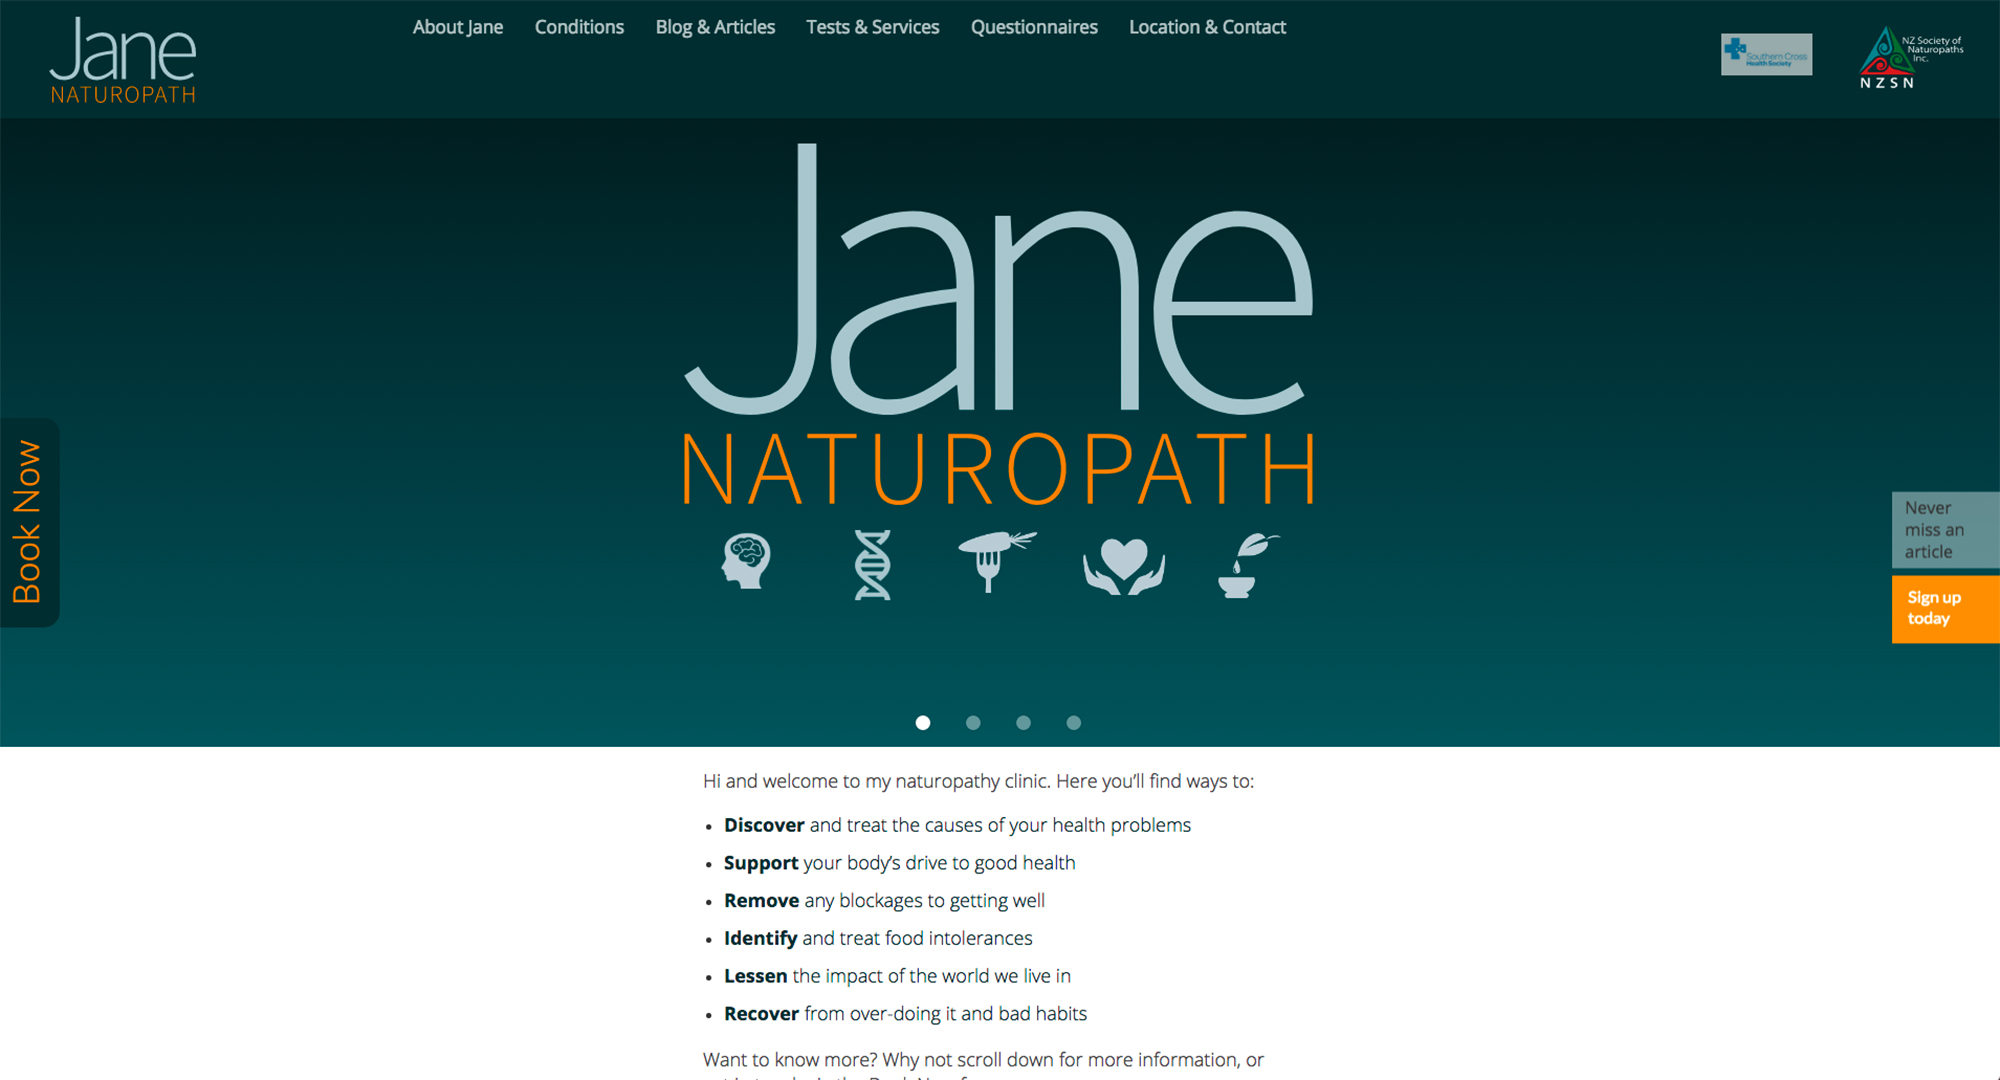 janenaturopath home page image